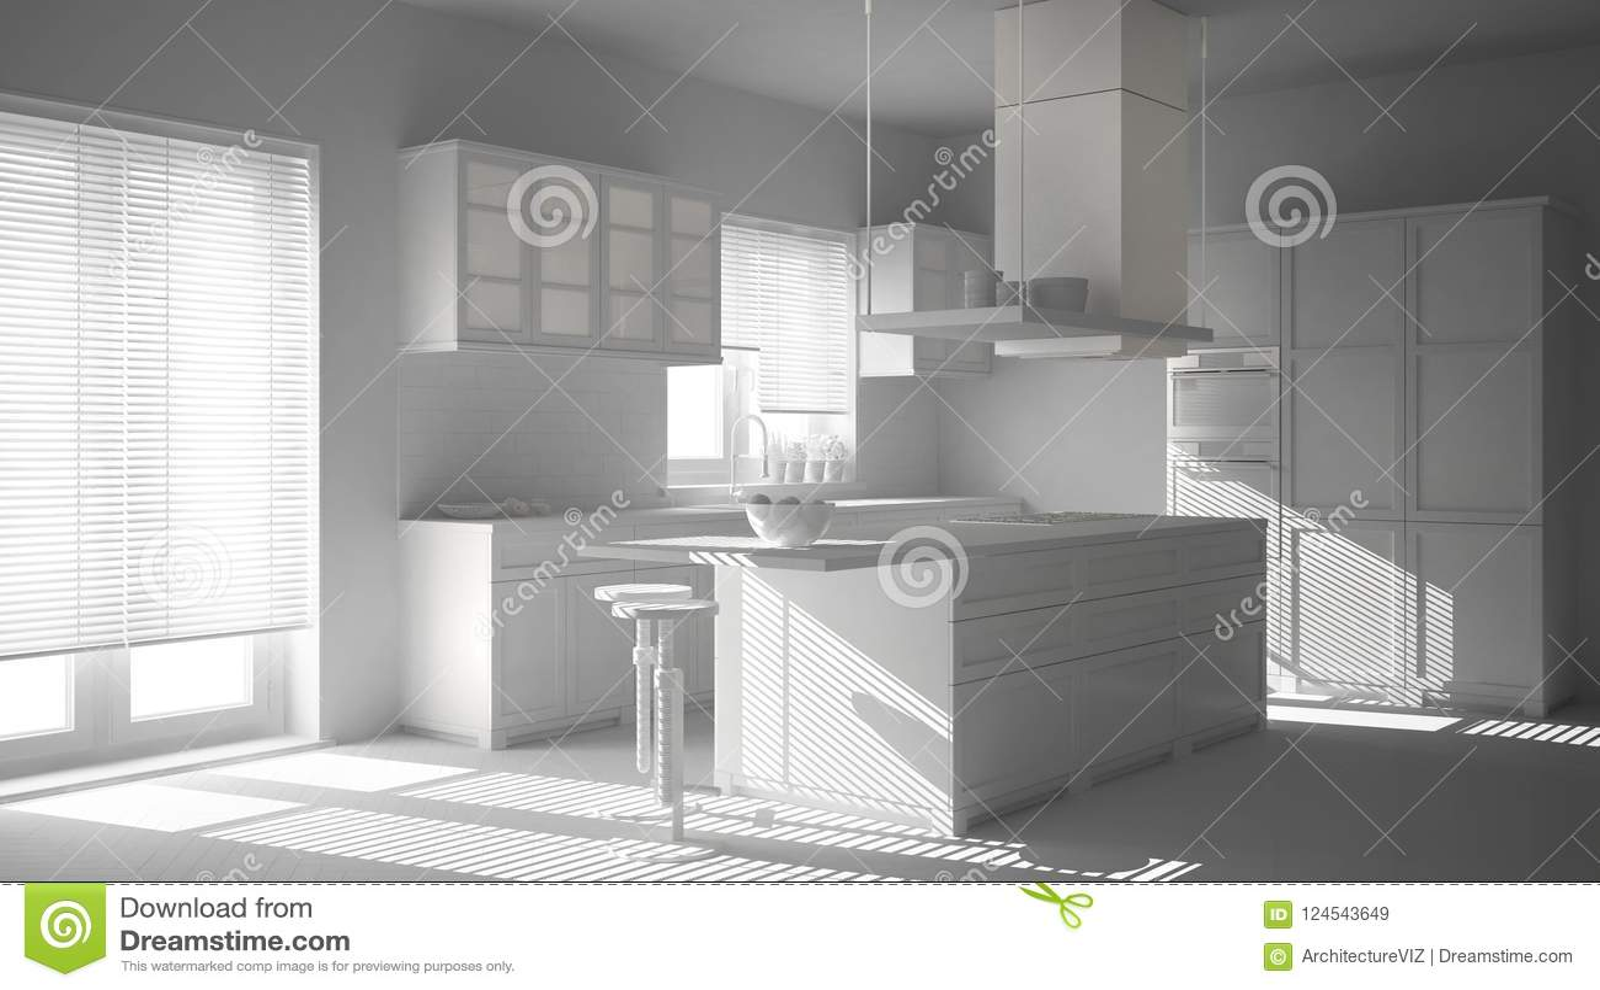 industrial kitchen stools outdoor appliances packages 总白色项目草稿 室内设计 现代木和白色厨房有海岛 凳子和窗口的 木条 木条地板人字形地板